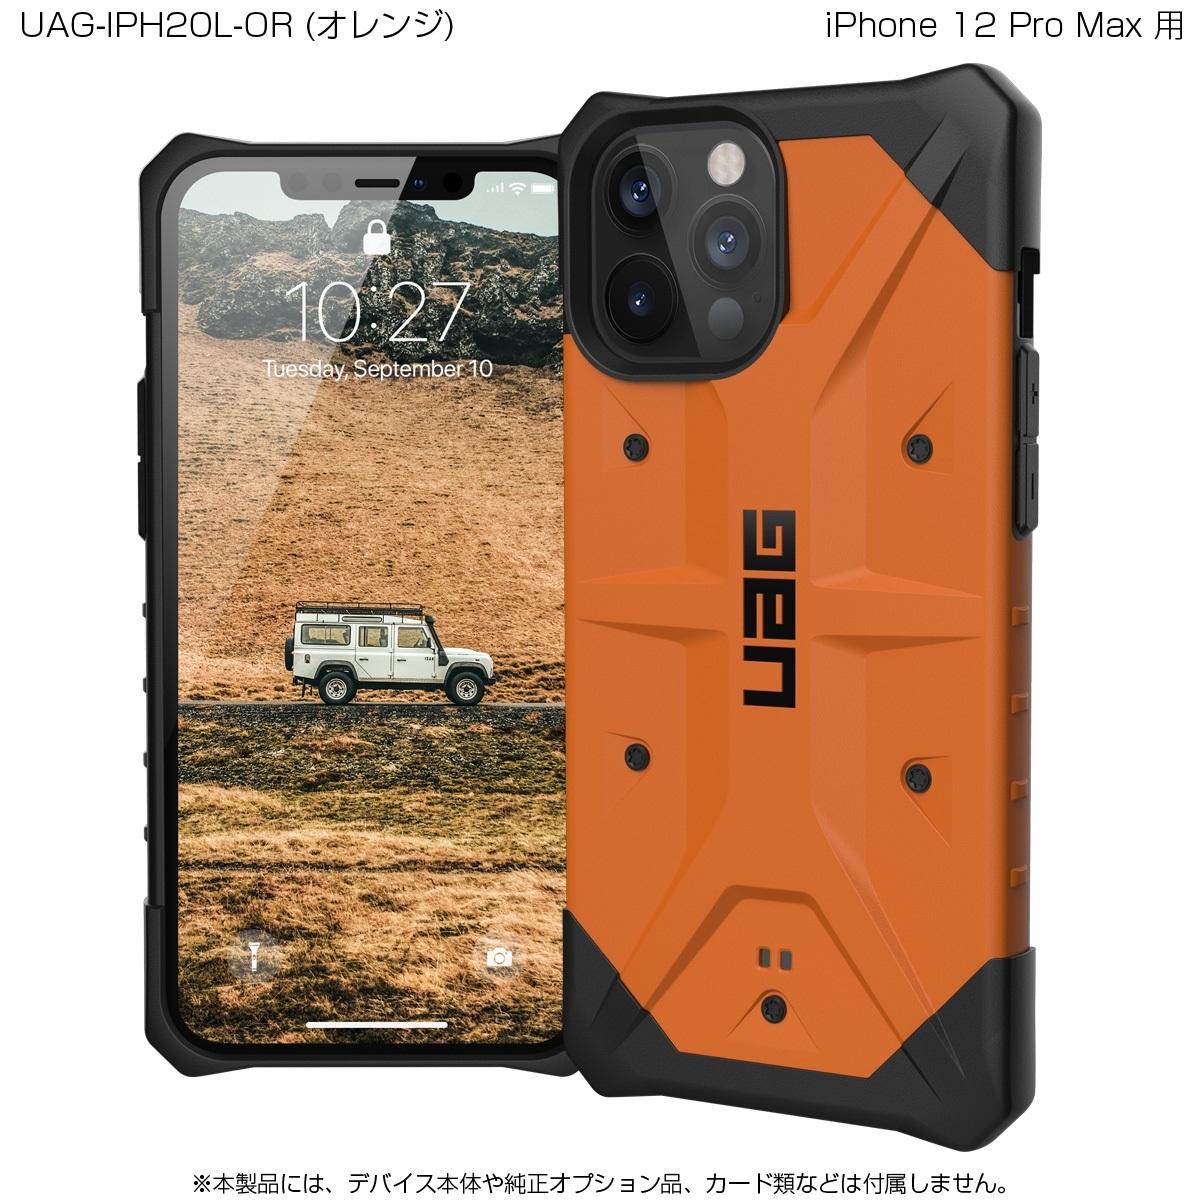 UAG iPhone 12 Pro Max用 PATHFINDERケース スタンダード 全6色 耐衝撃 UAG-IPH20Lシリーズ 6.7インチ